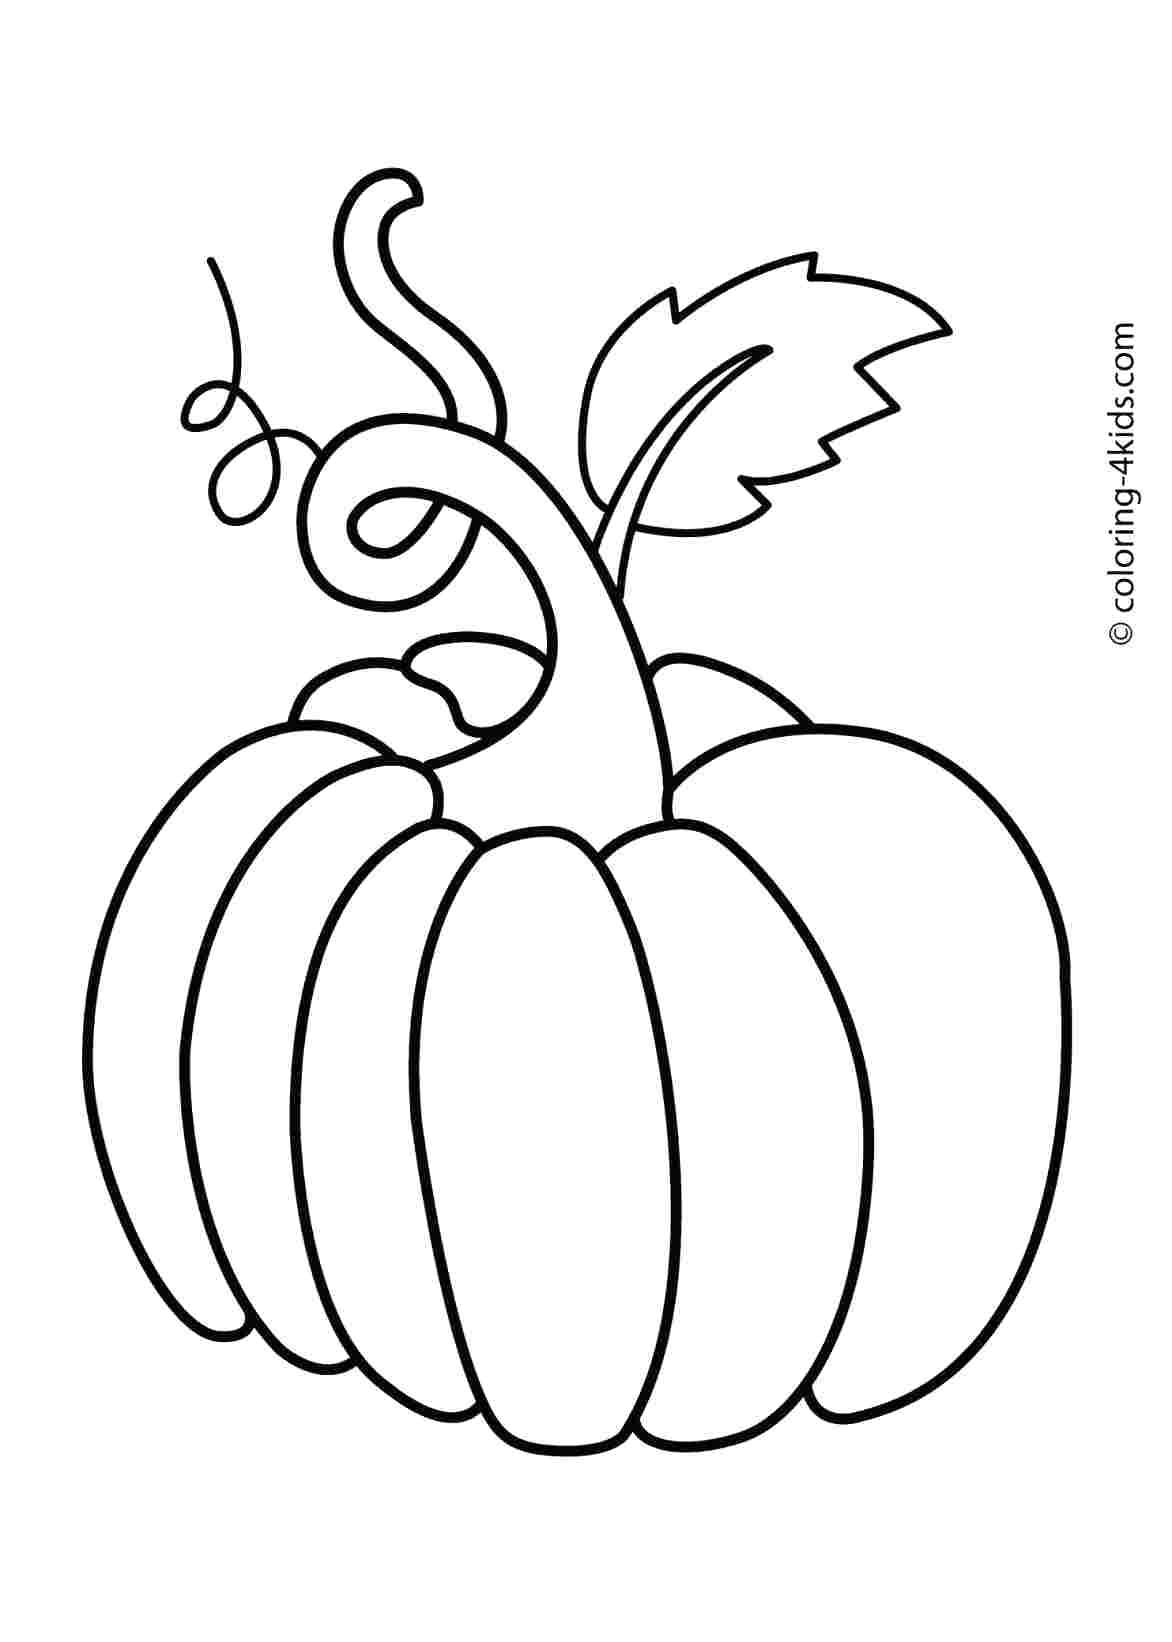 1172x1642 pumpkins drawing personal use pumpkin easy drawings for pumpkins